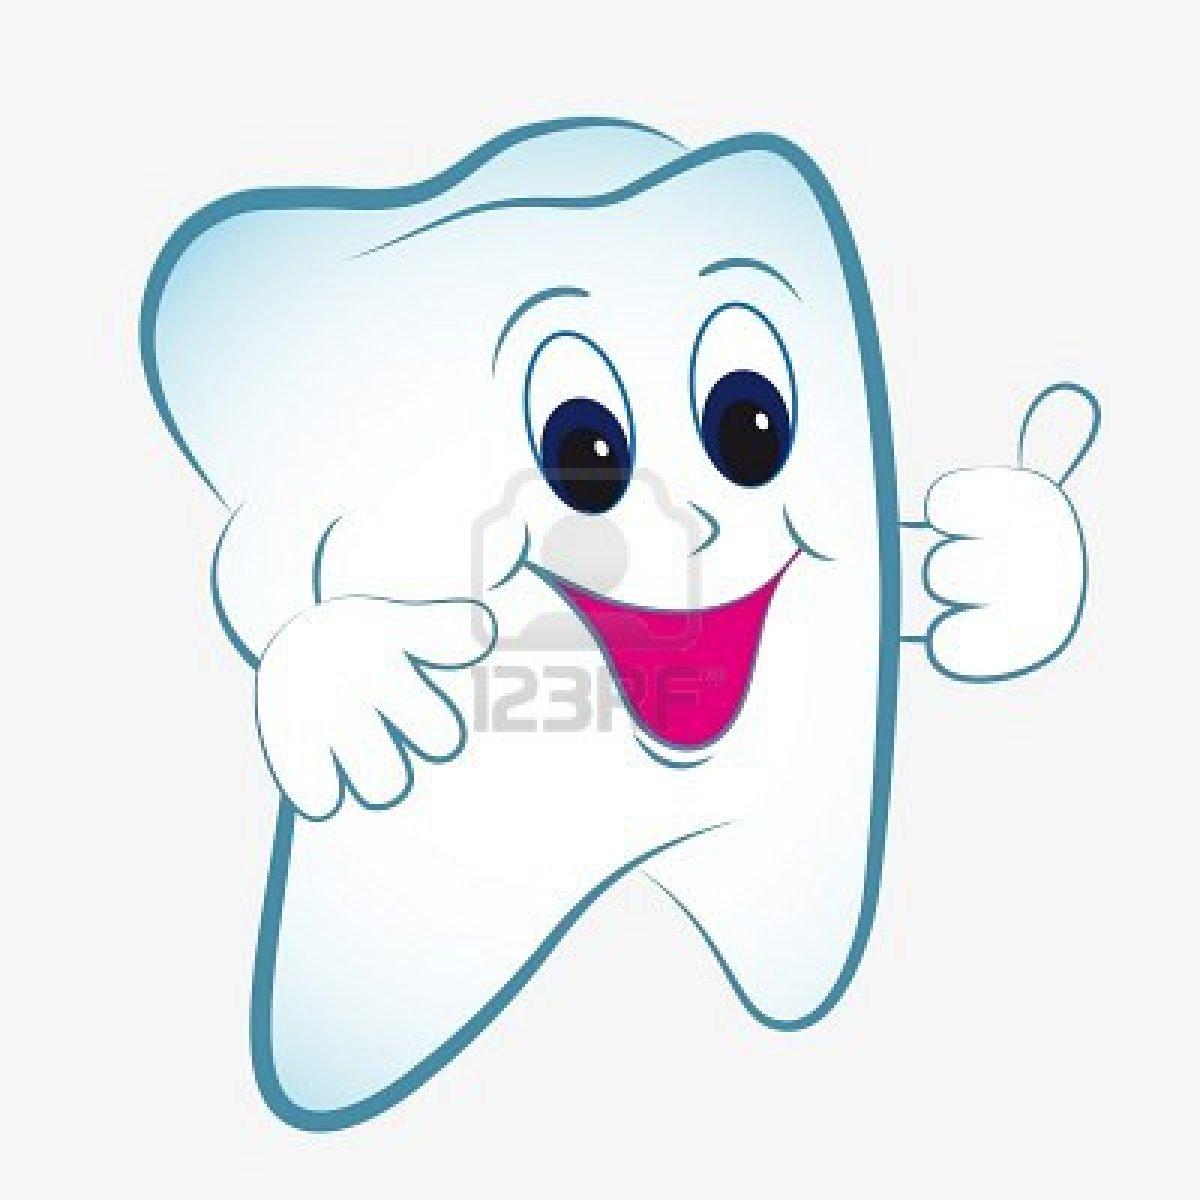 Mangalam Multispeciality Laser Dental Facio Maxillary Clinic and Implant Centre